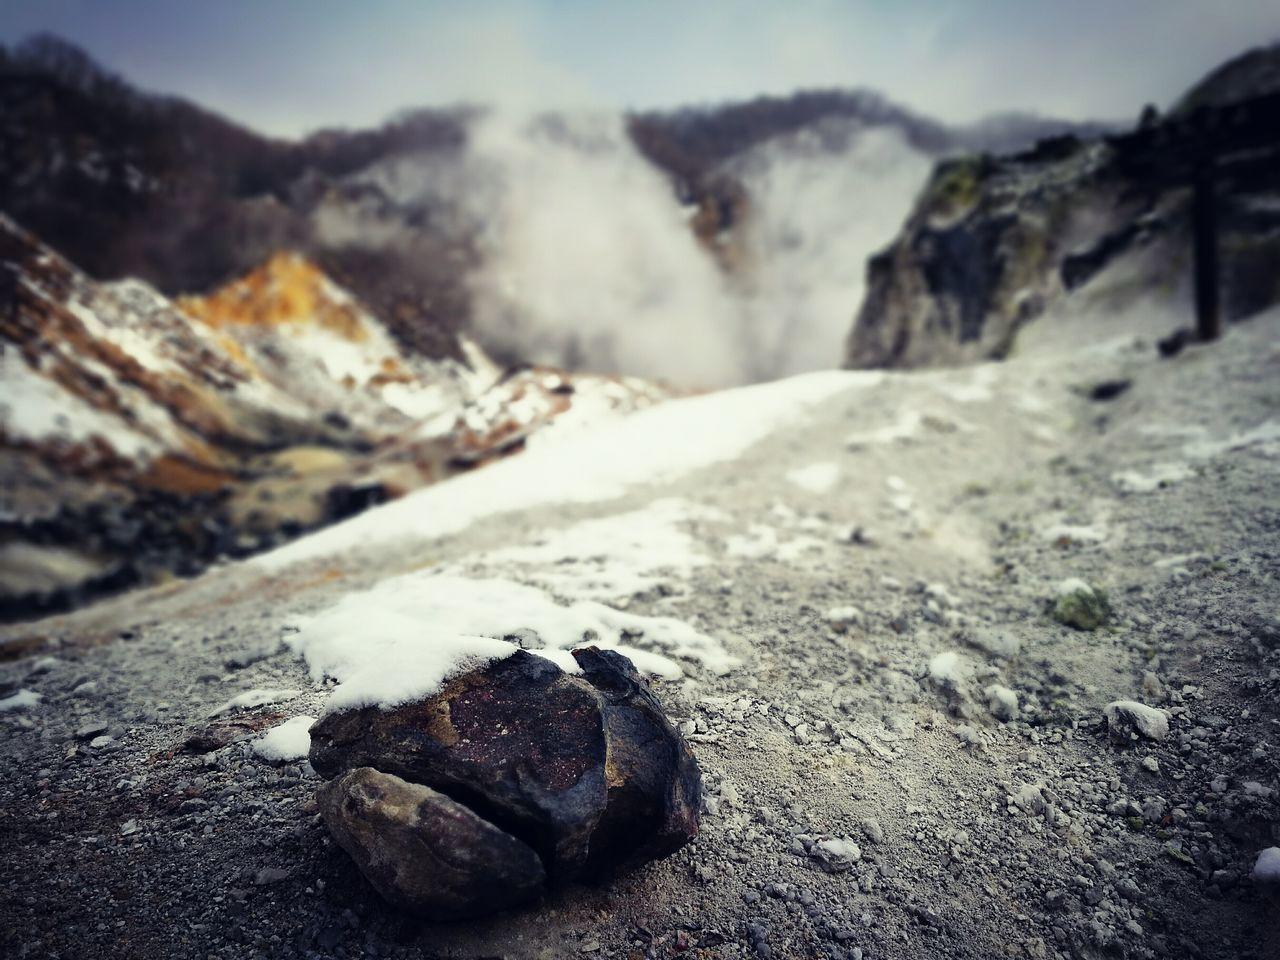 Japan Japan Photography Landscape_Collection Landscape_photography Mountain Nature Noboribetsu Onsen Outdoors